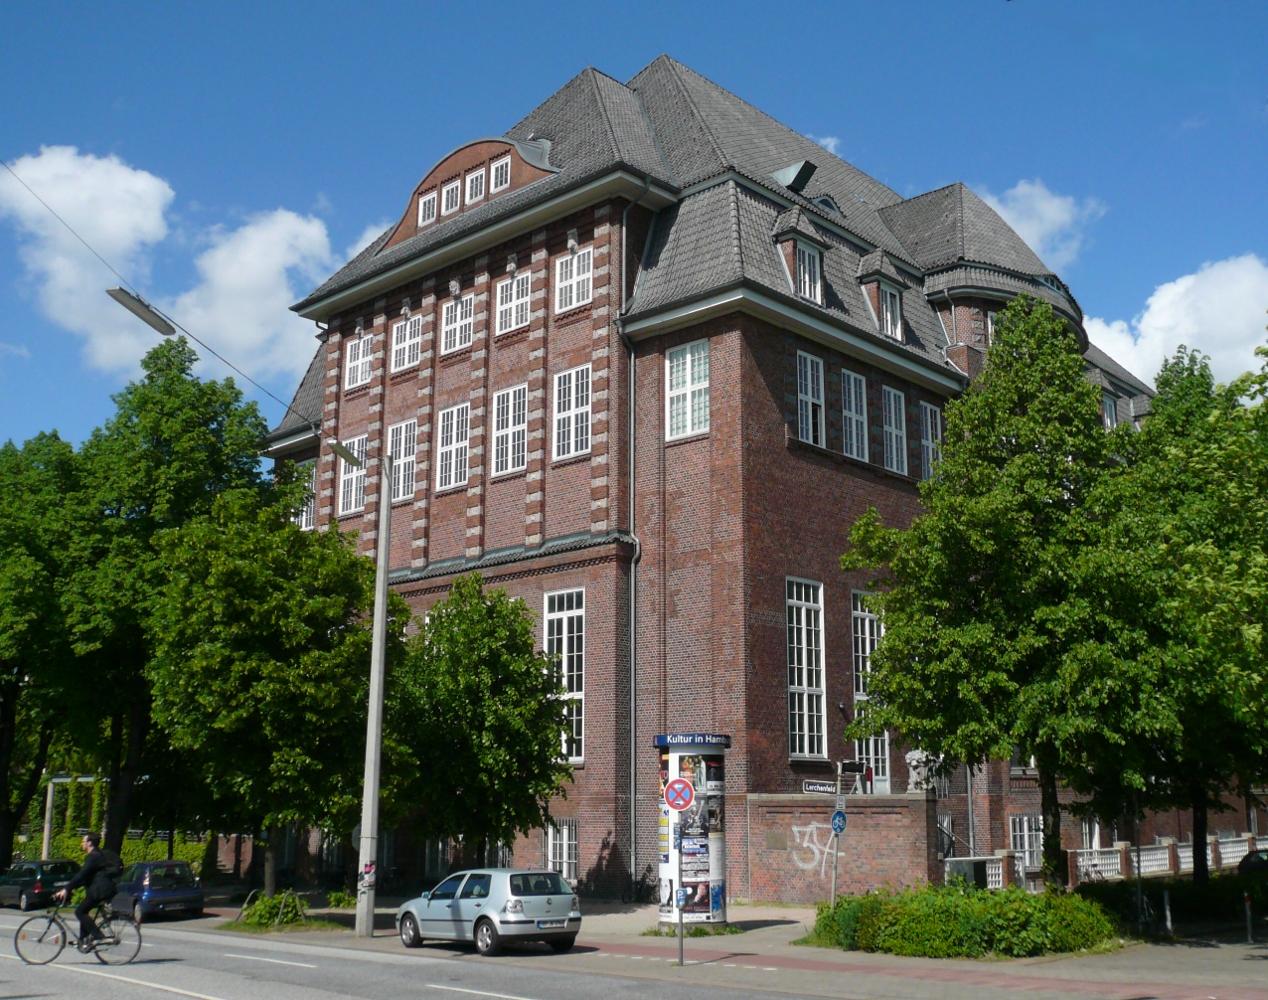 3%2f3d%2fhamburg.lerchenfeld.haw kunsthochschule.wmt